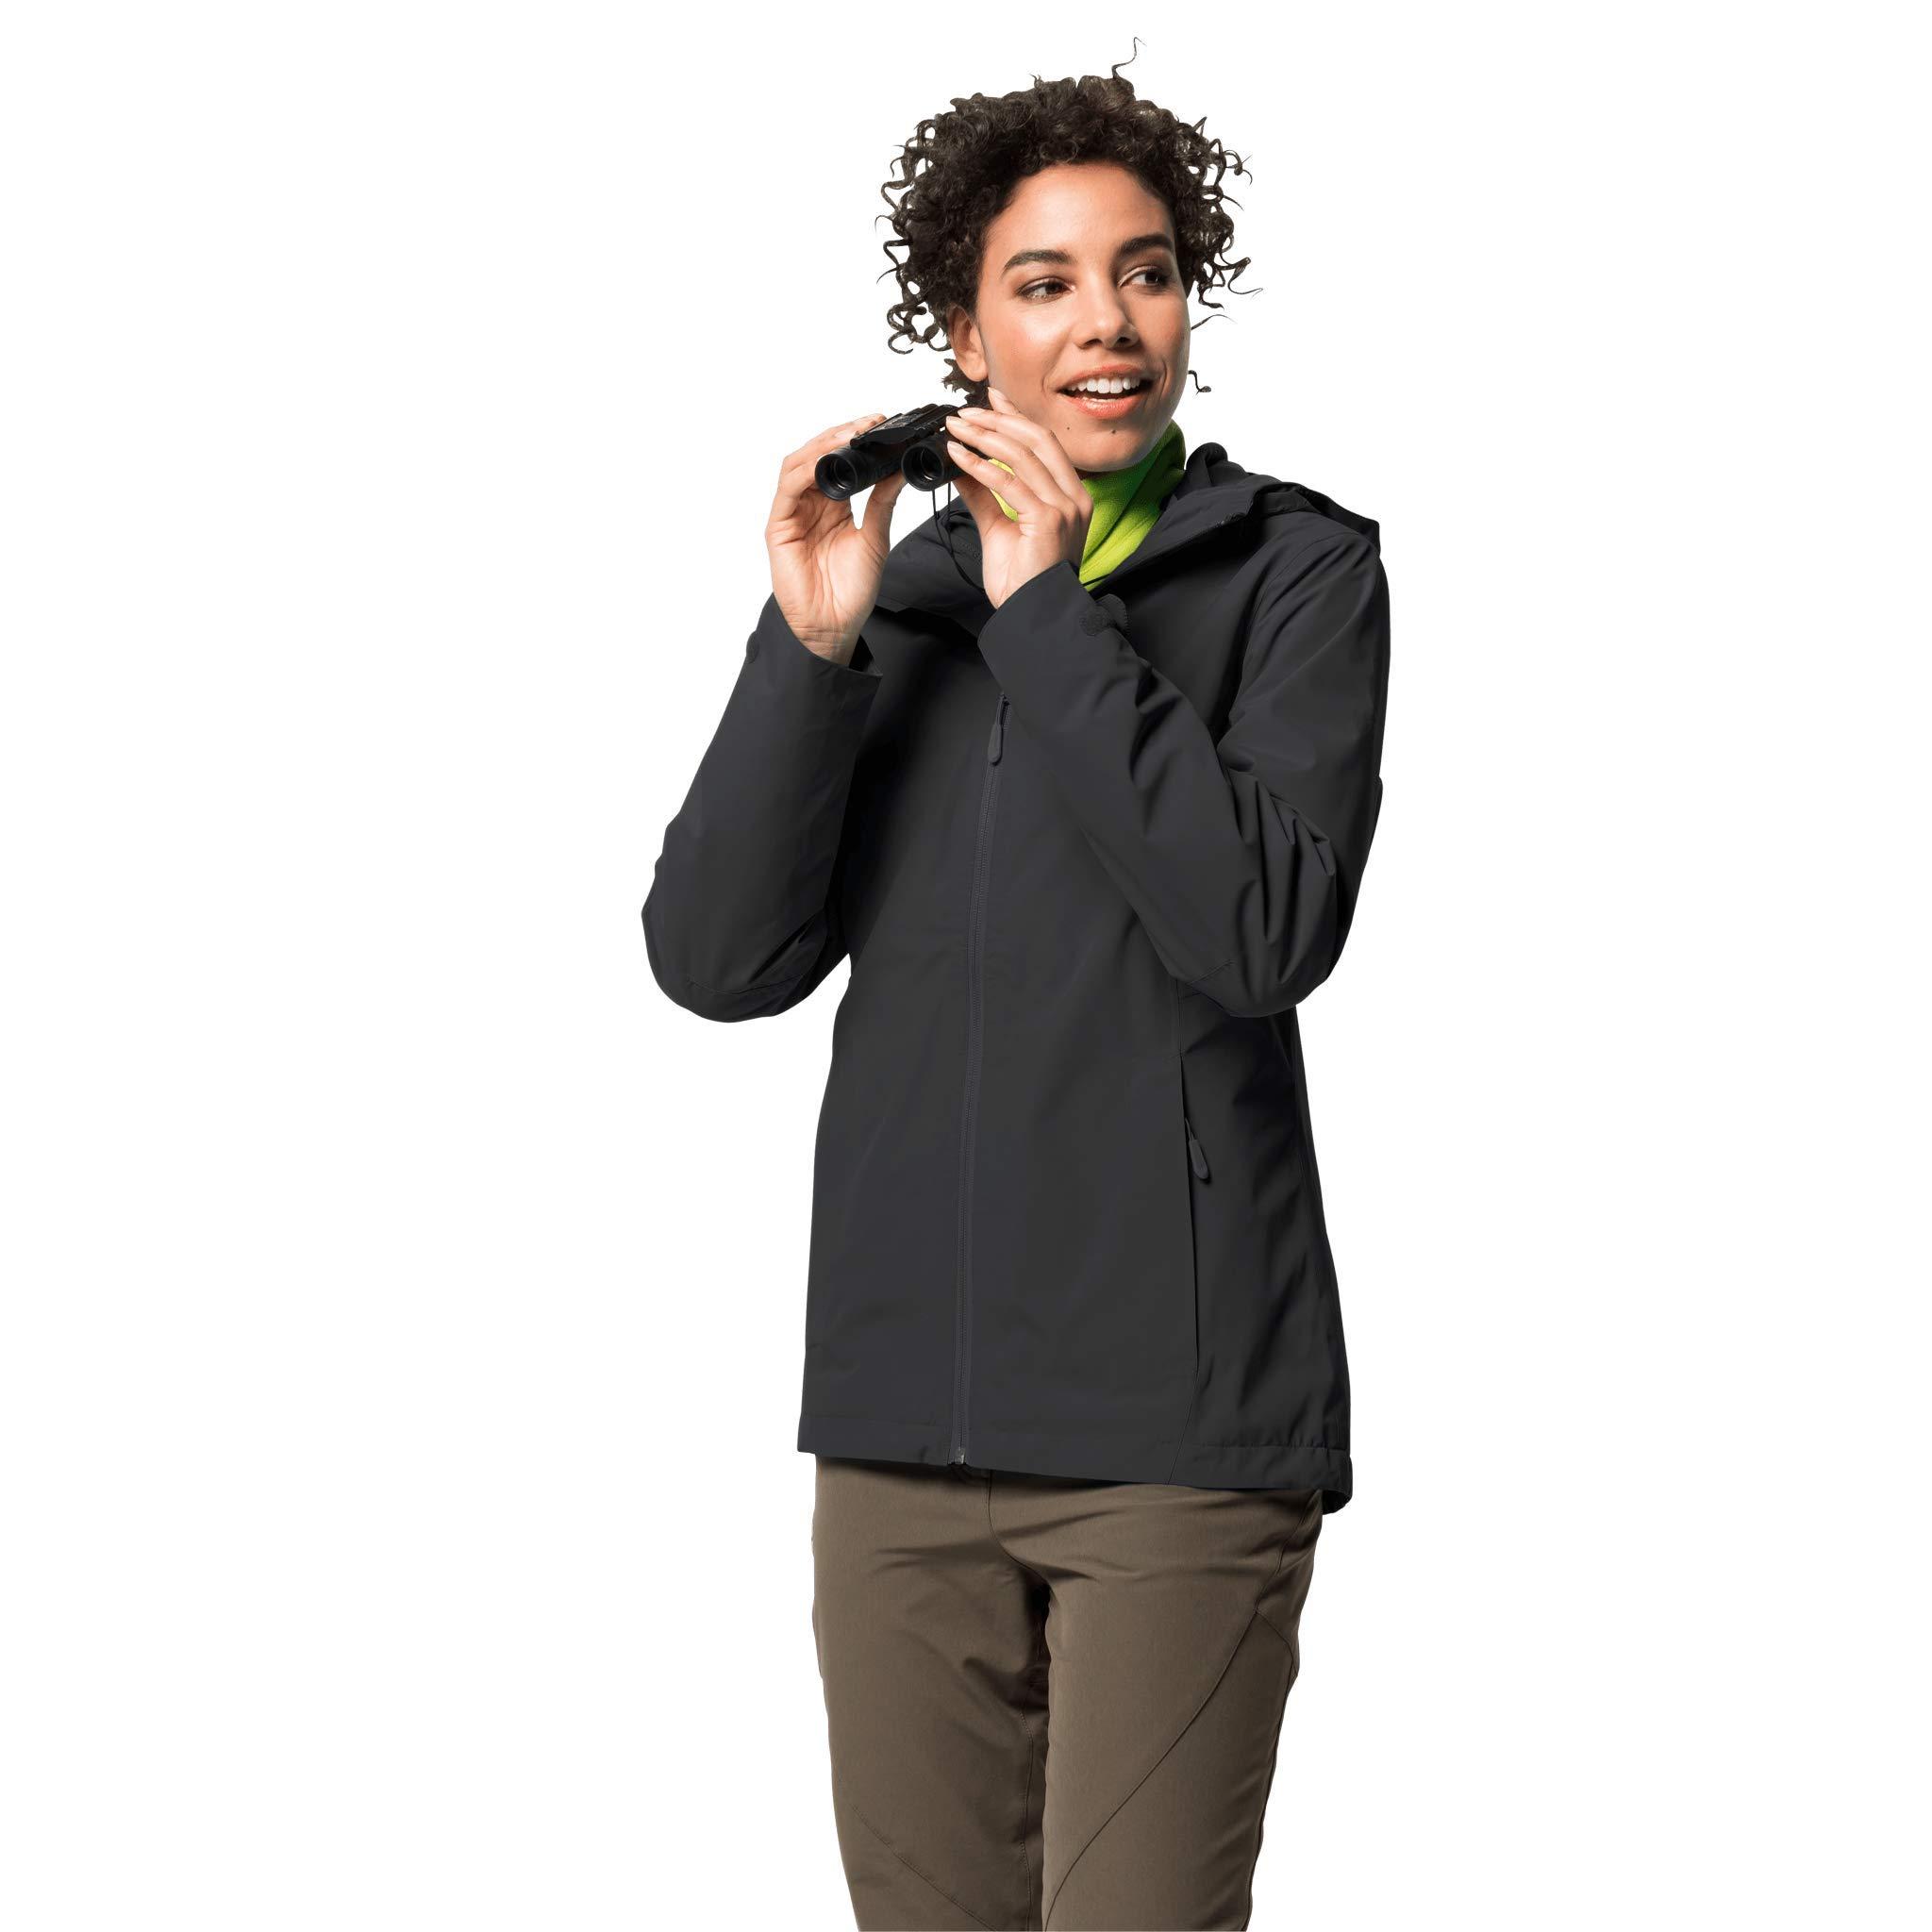 Jack Wolfskin Damen Norrland 3in1 W Damen Jacke, schwarz, 5 EU